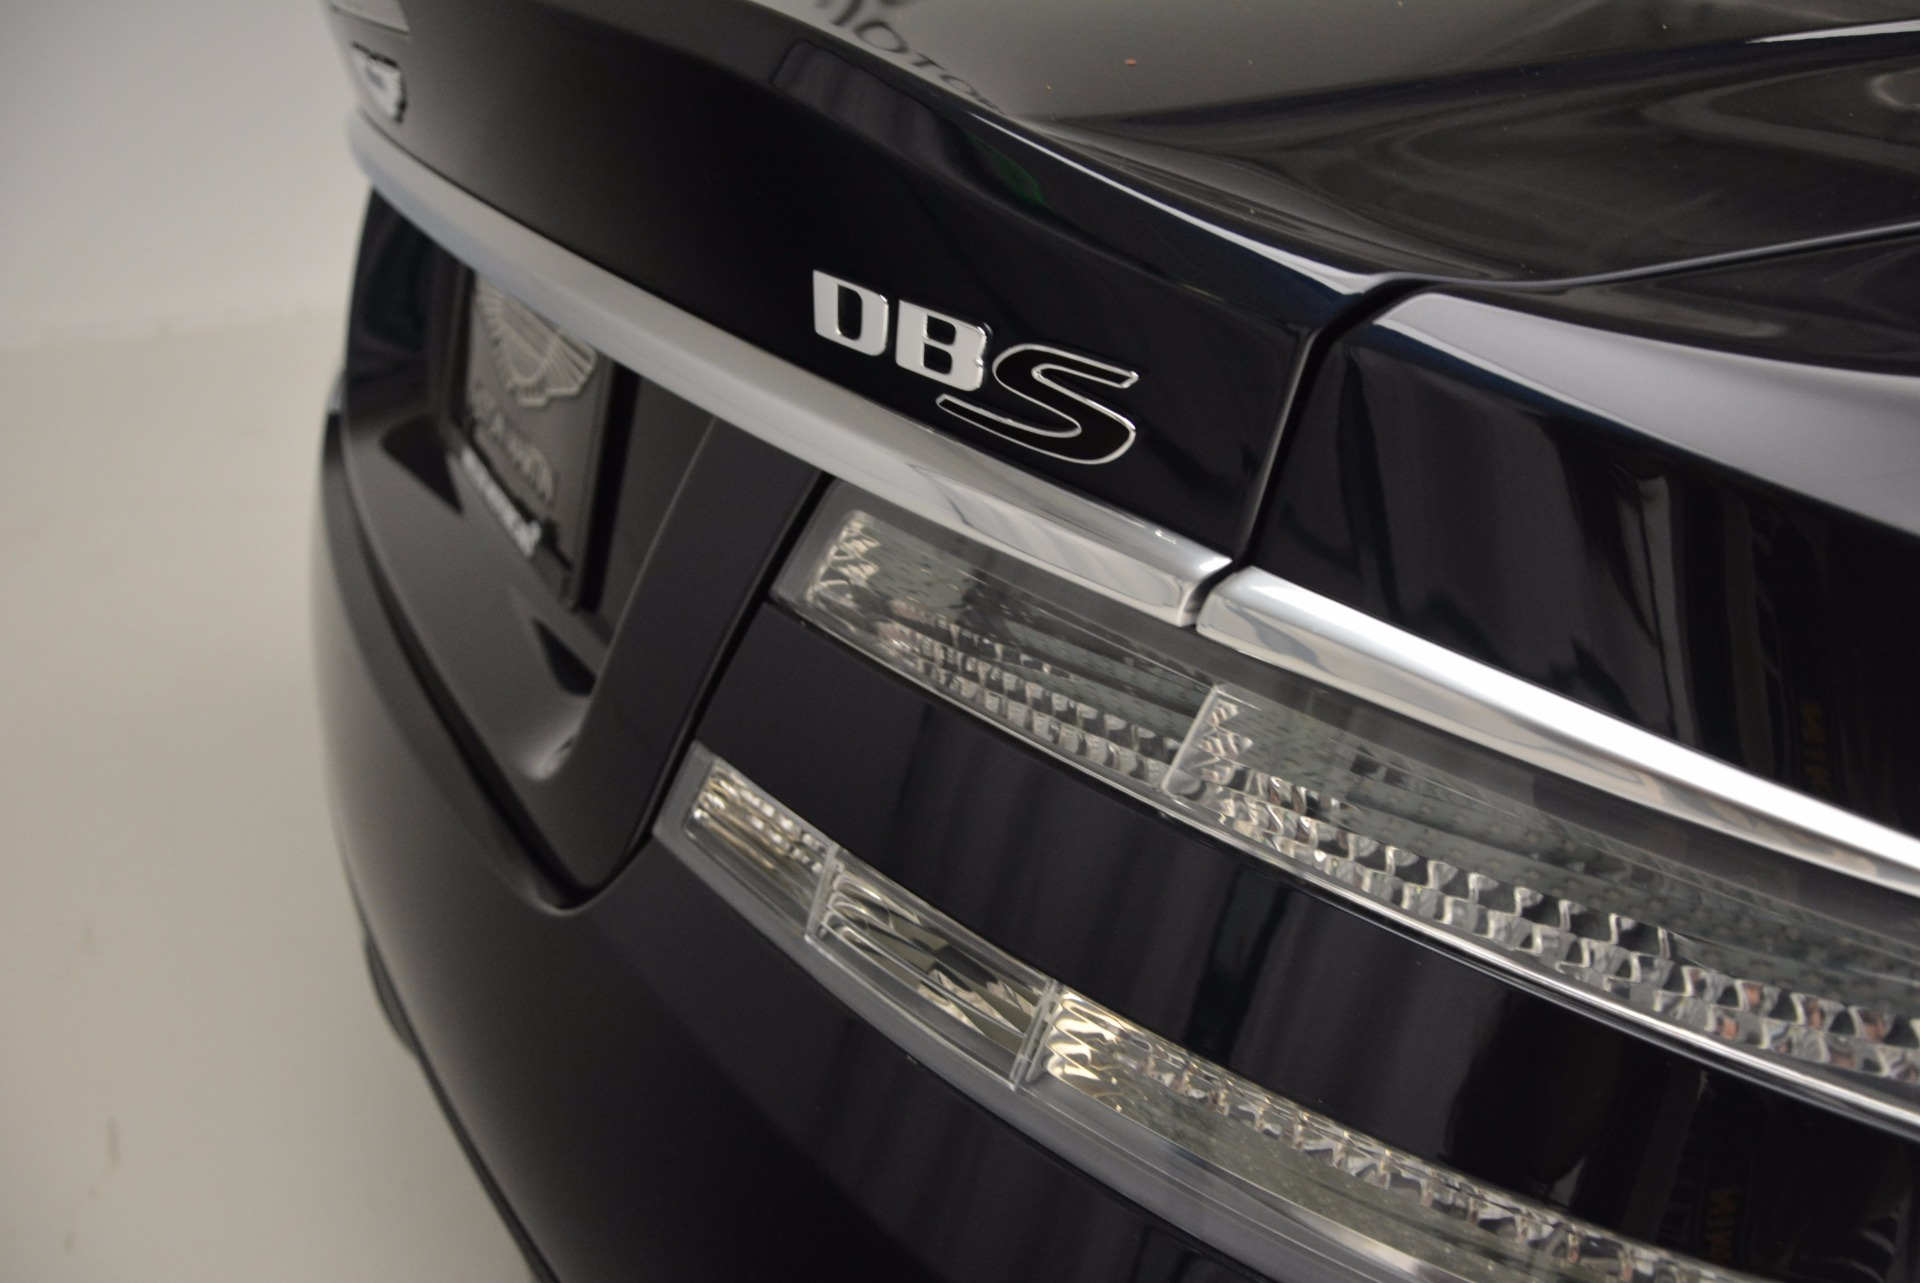 Used 2012 Aston Martin DBS Volante For Sale In Greenwich, CT 644_p35